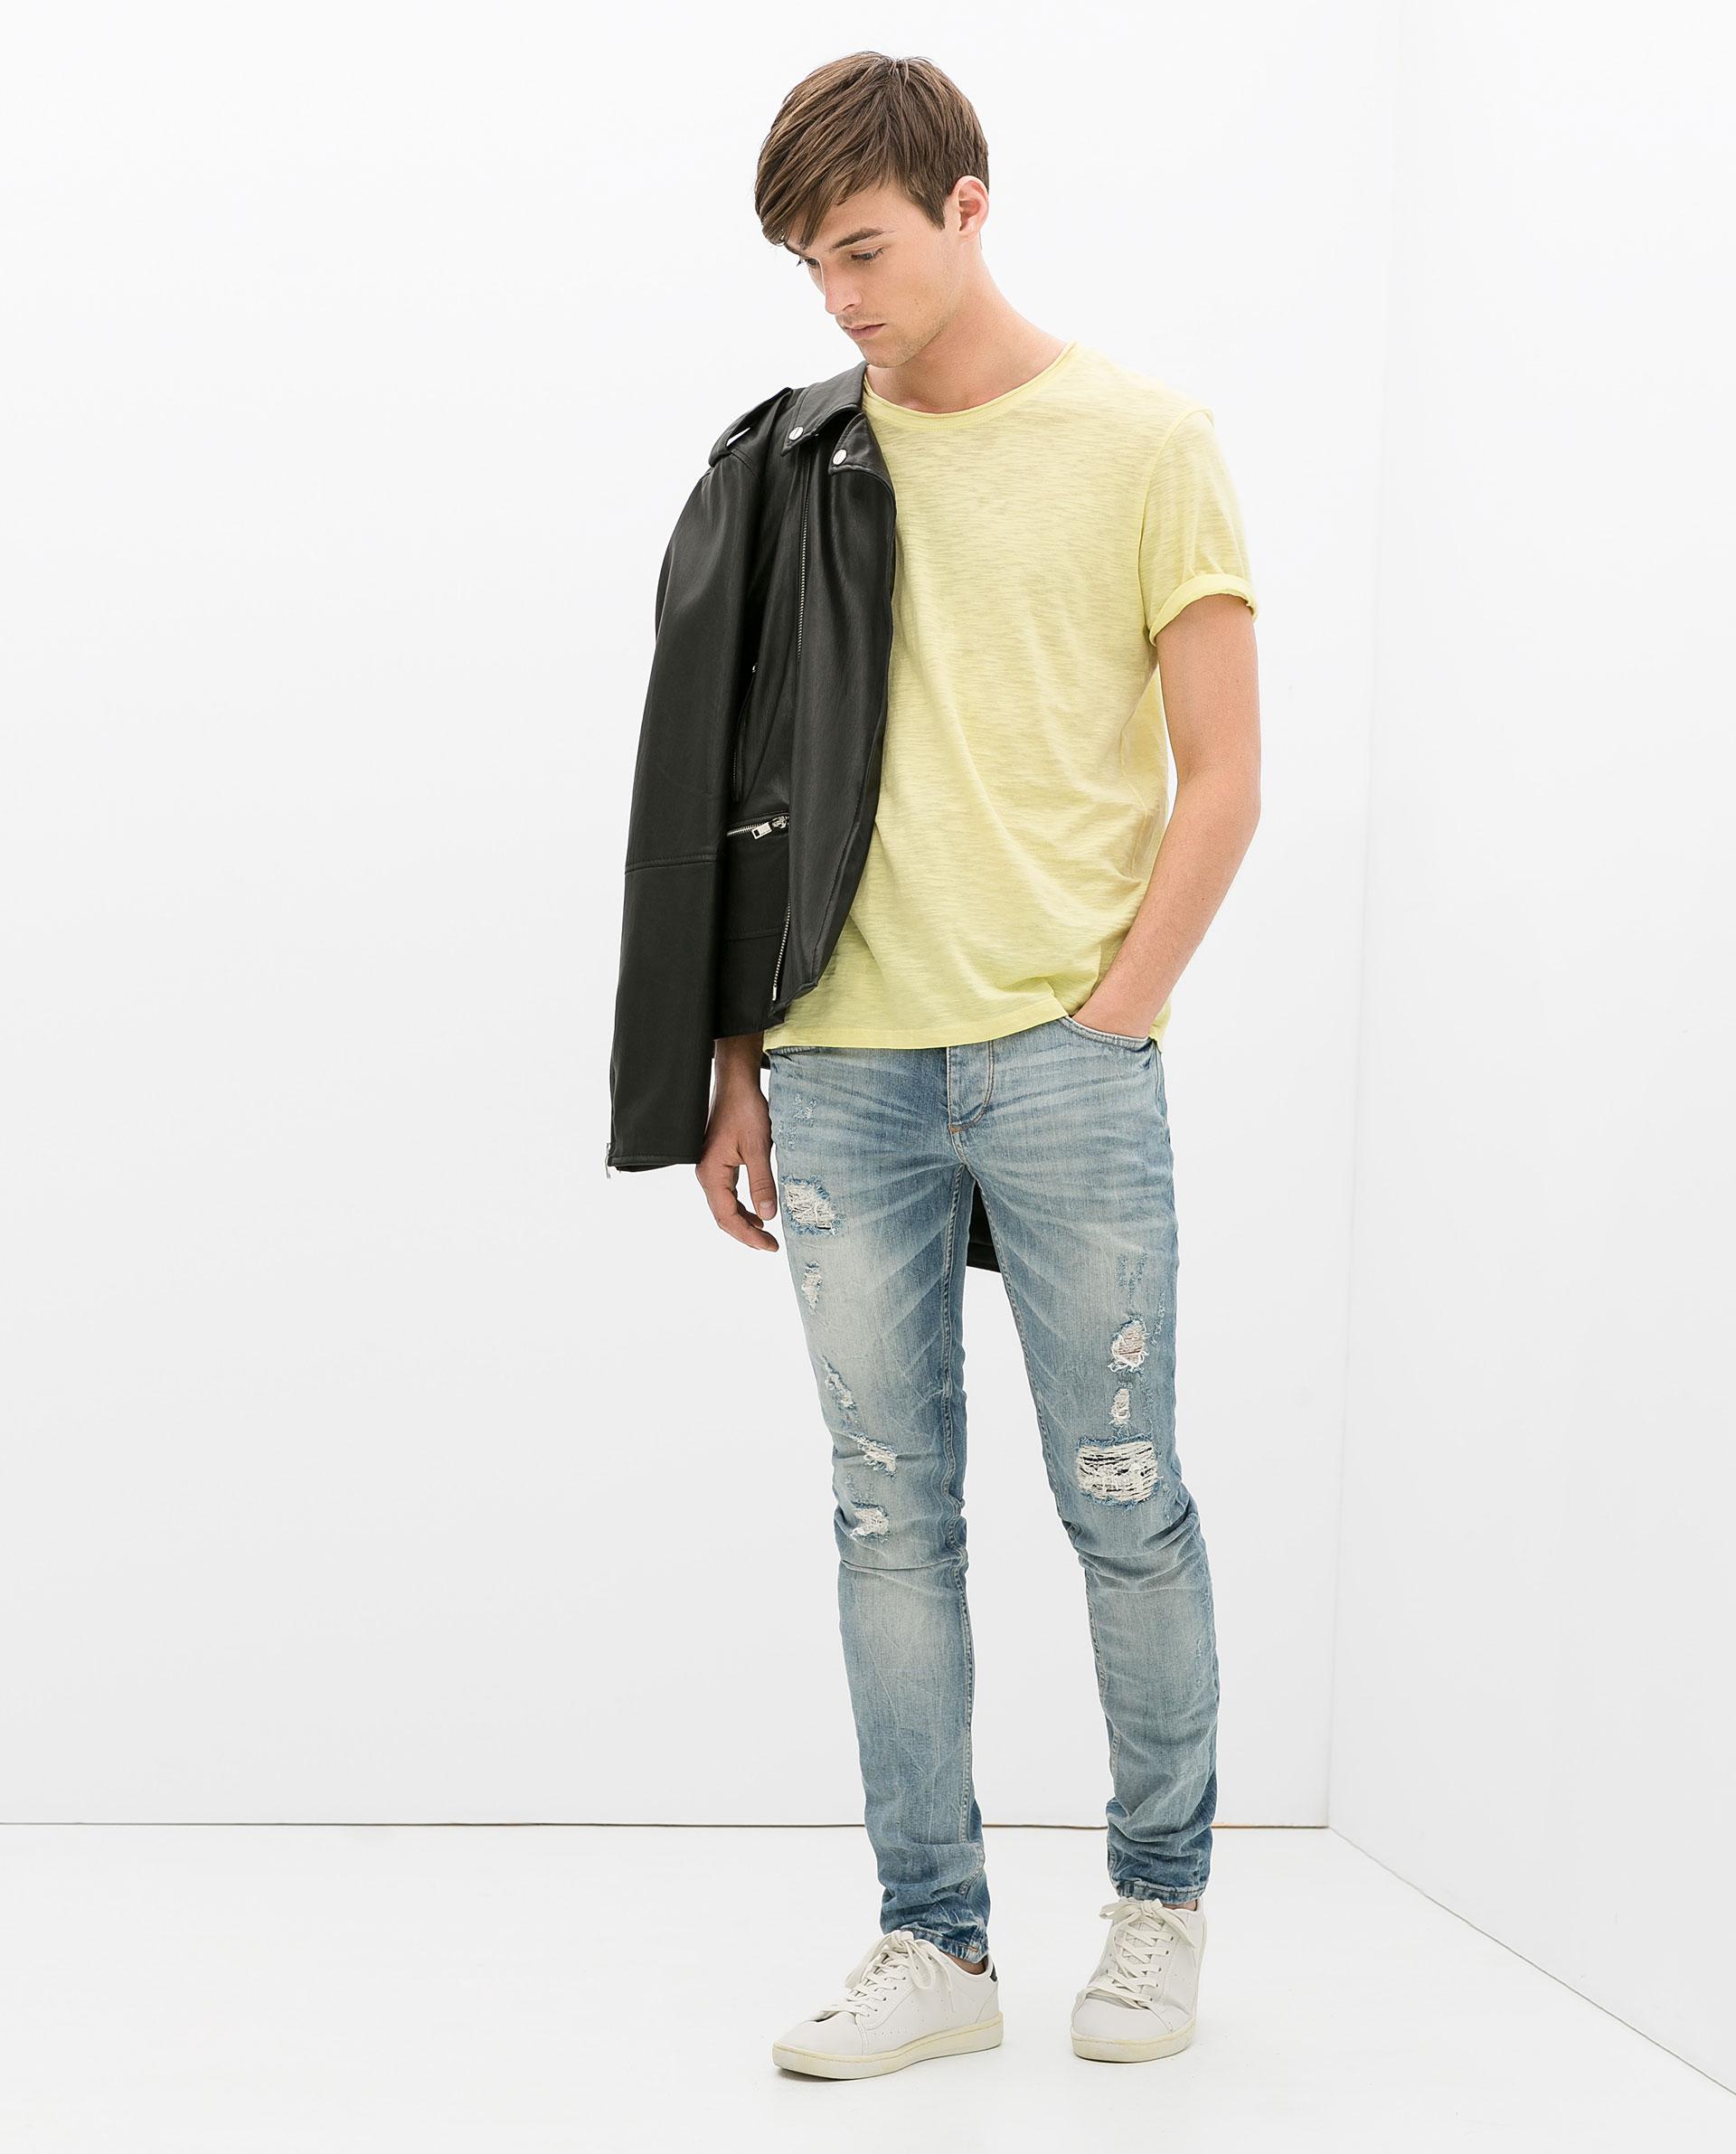 Black t shirt and blue jeans - Black T Shirt Light Blue Jeans Men S Black Leather Biker Jacket Yellow Crew Neck